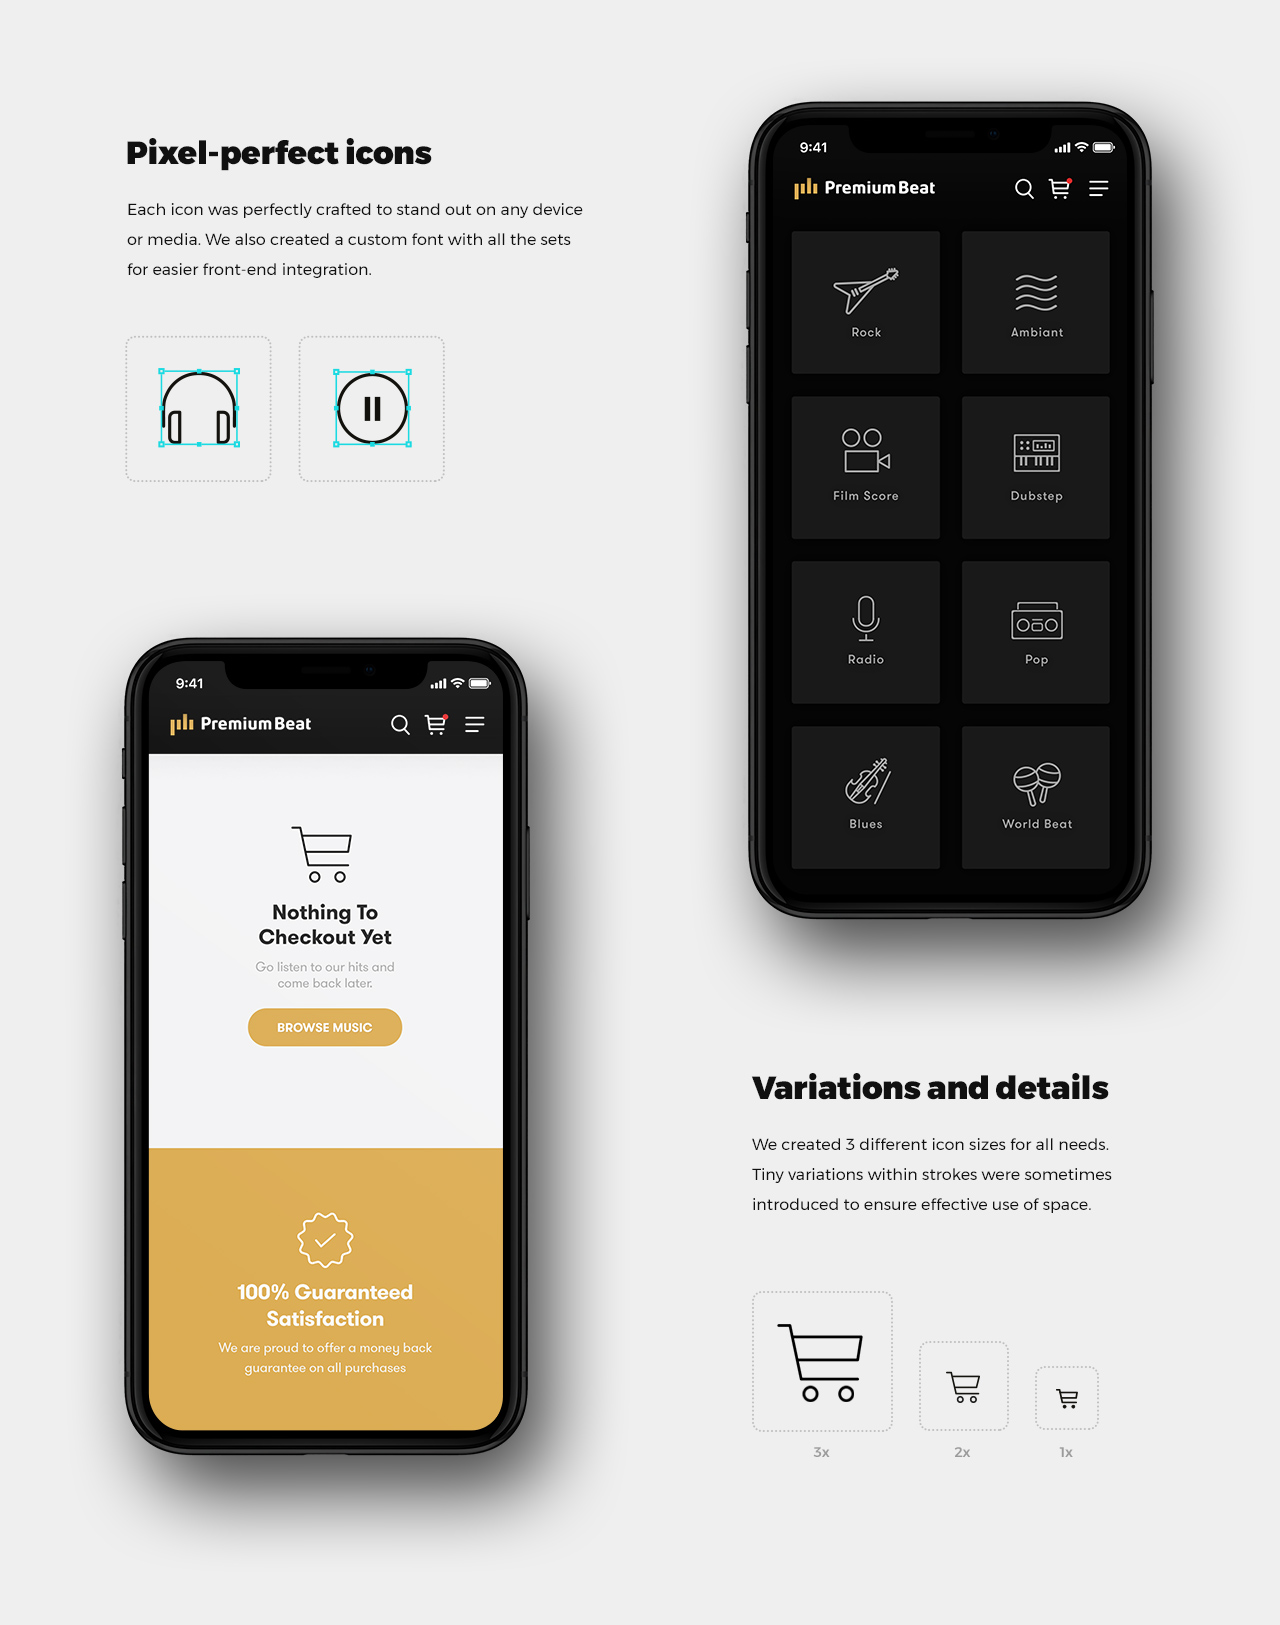 PB-brand-icons-details2